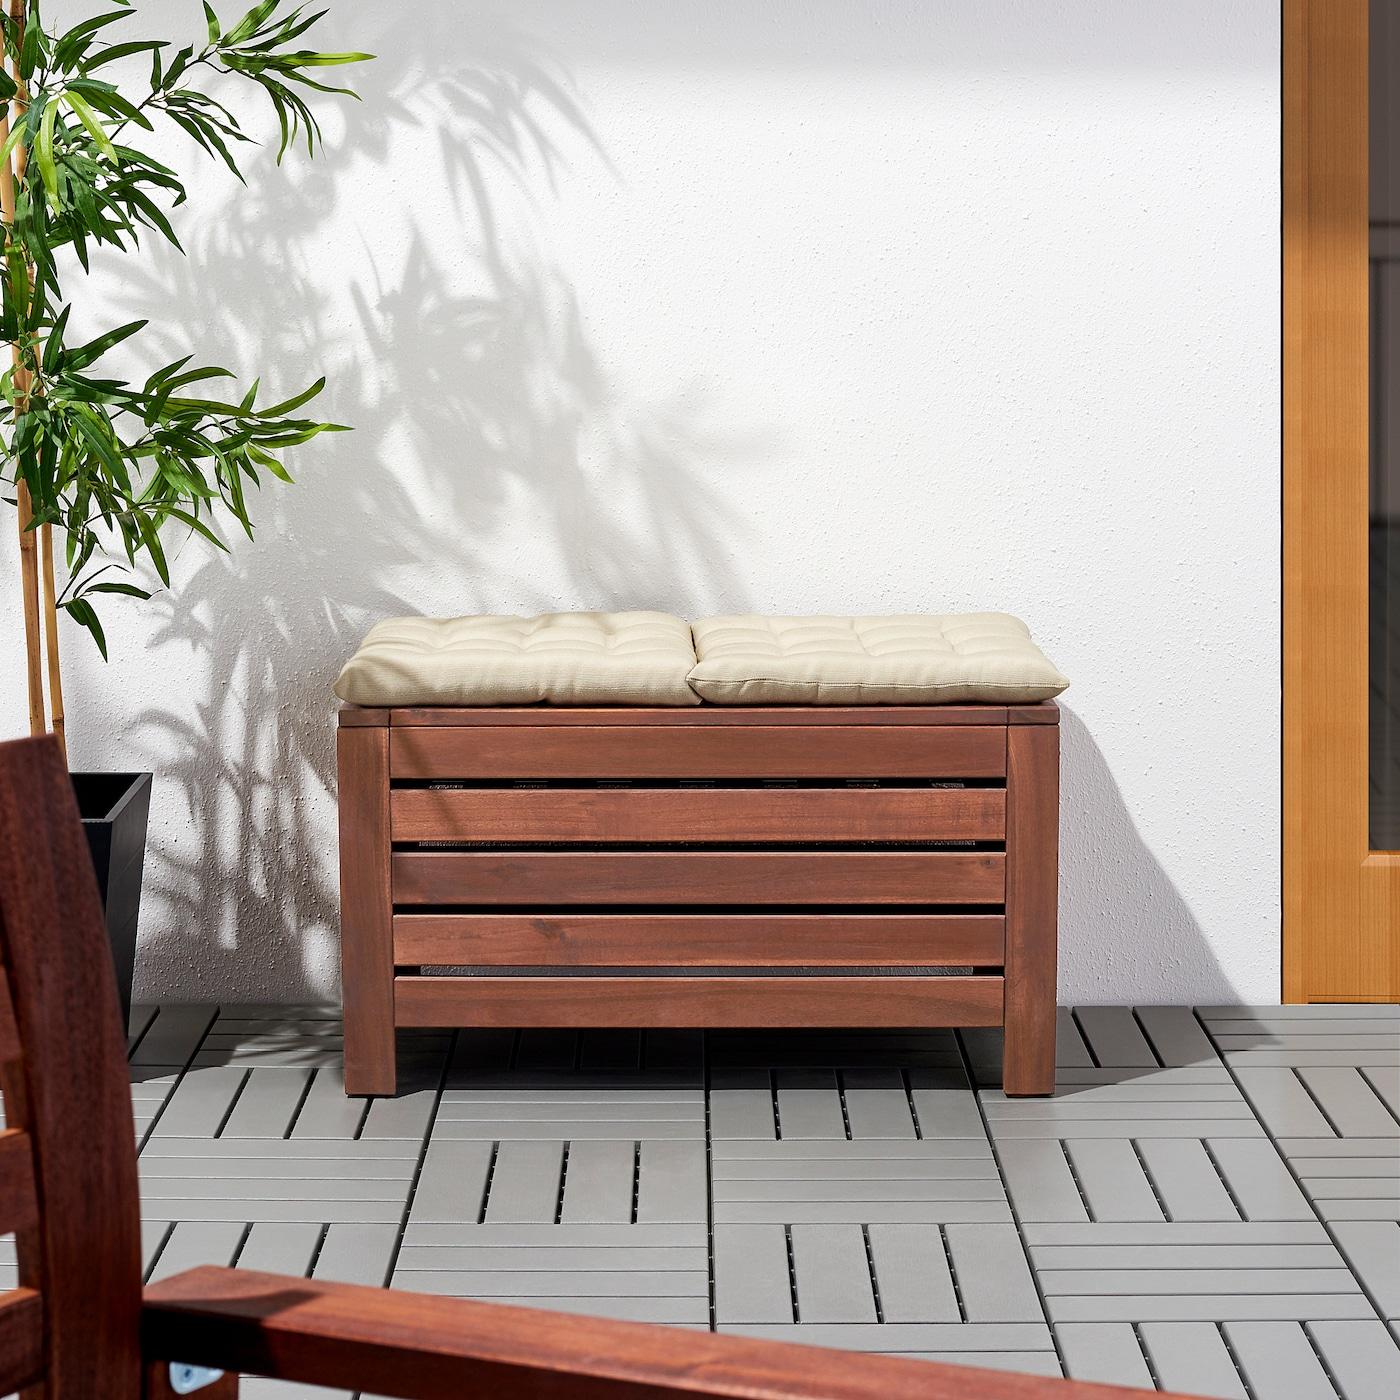 Applaro Storage Bench Outdoor Brown Brown Stained Ikea